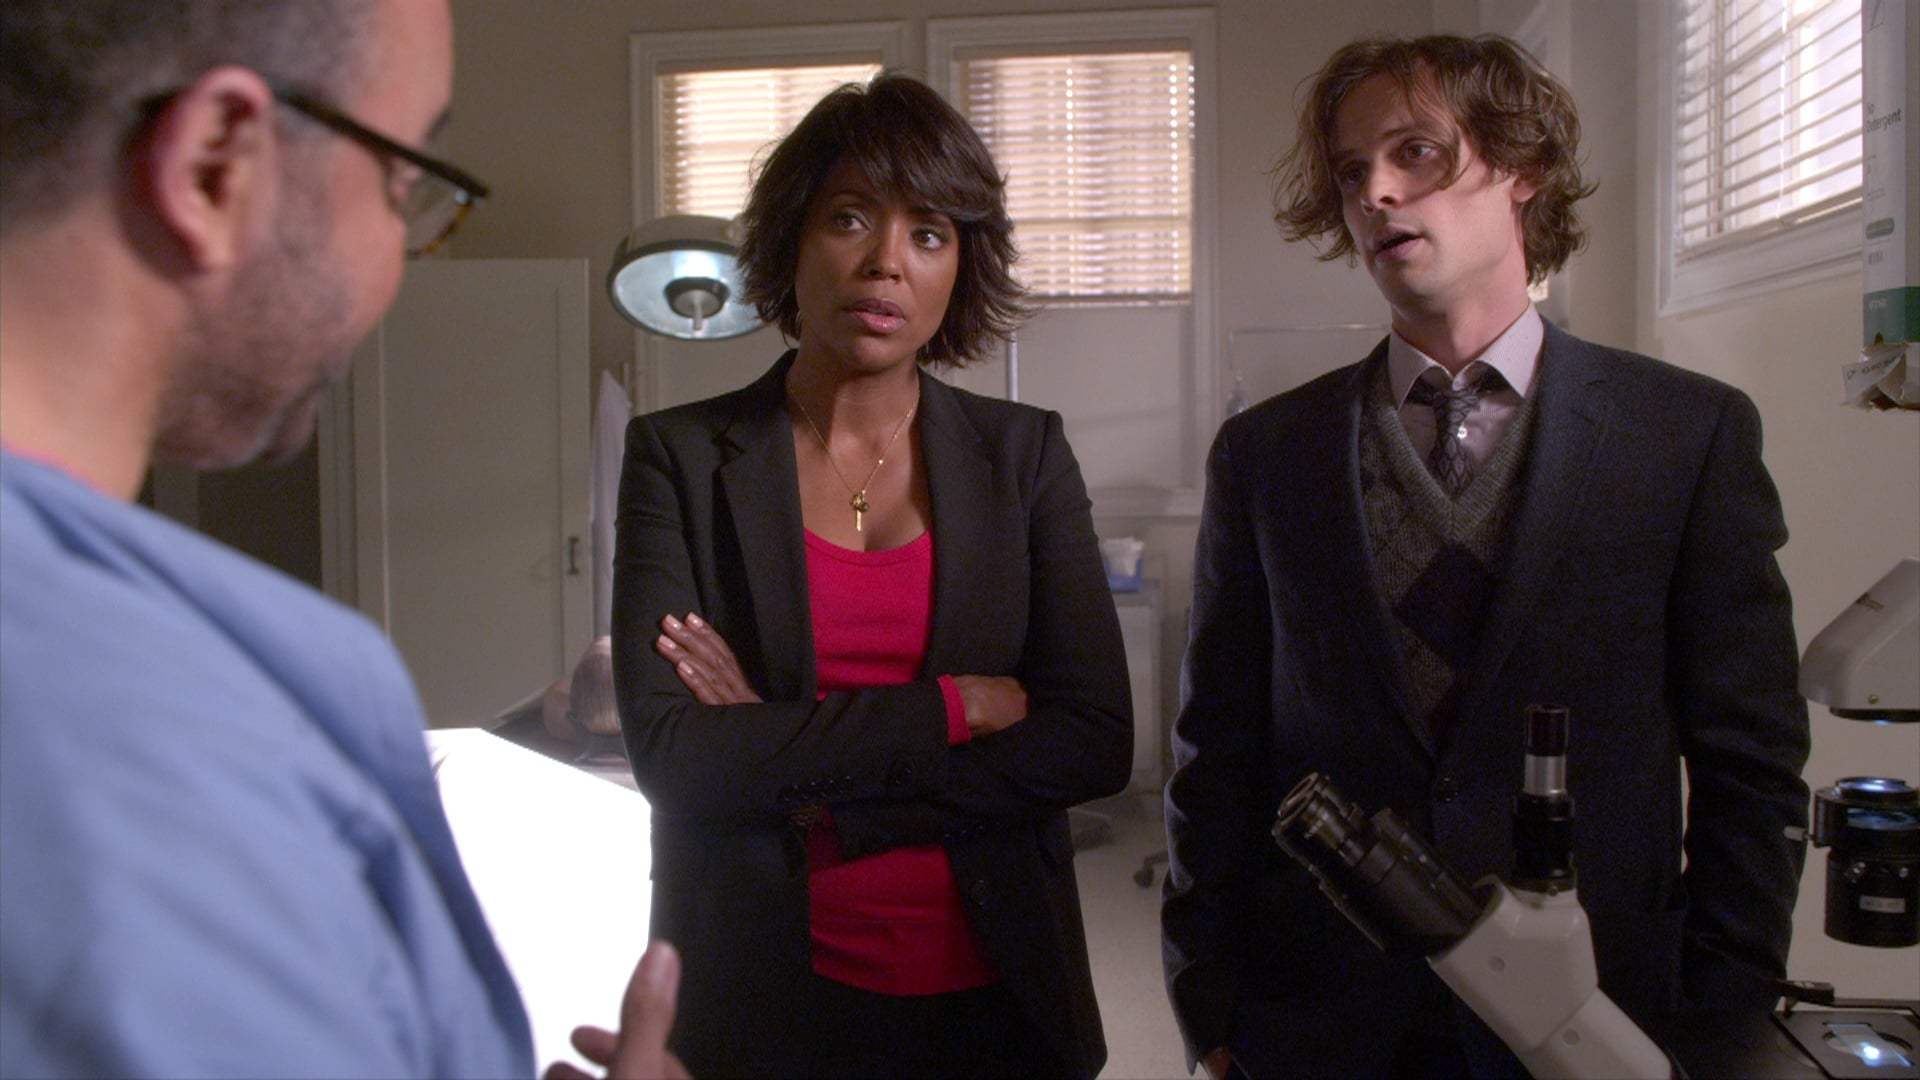 Criminal Minds - Season 11 Episode 17 : The Sandman